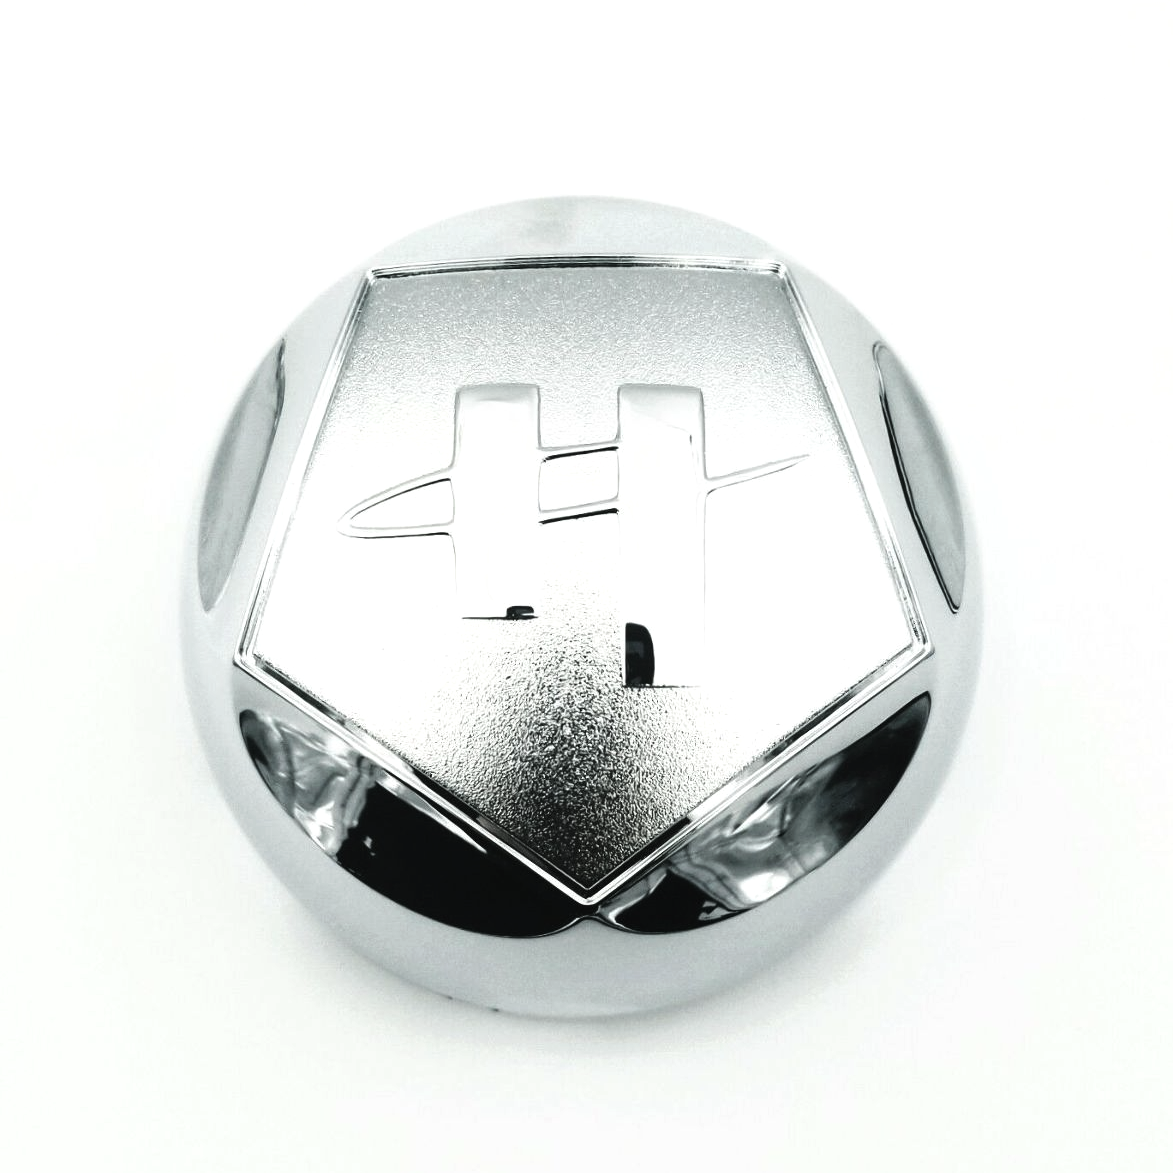 "Helo Chrome Wheel Center Cap 3"" (81mm) Diameter for HE789 HE791 5x114.3 5x127"